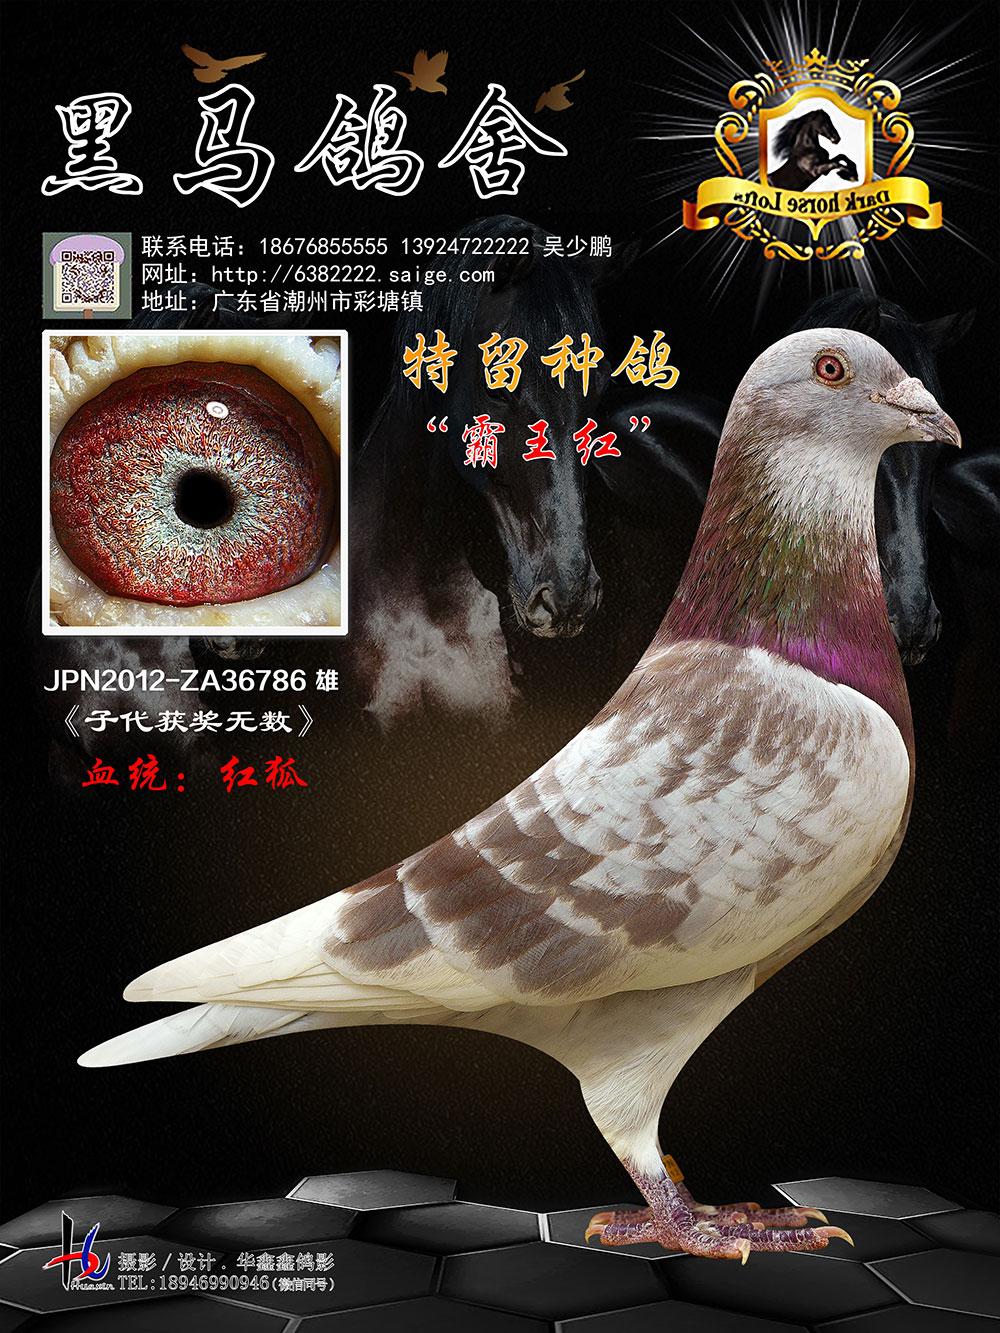 特留�N�� 霸王�t JPN2012-ZA36786